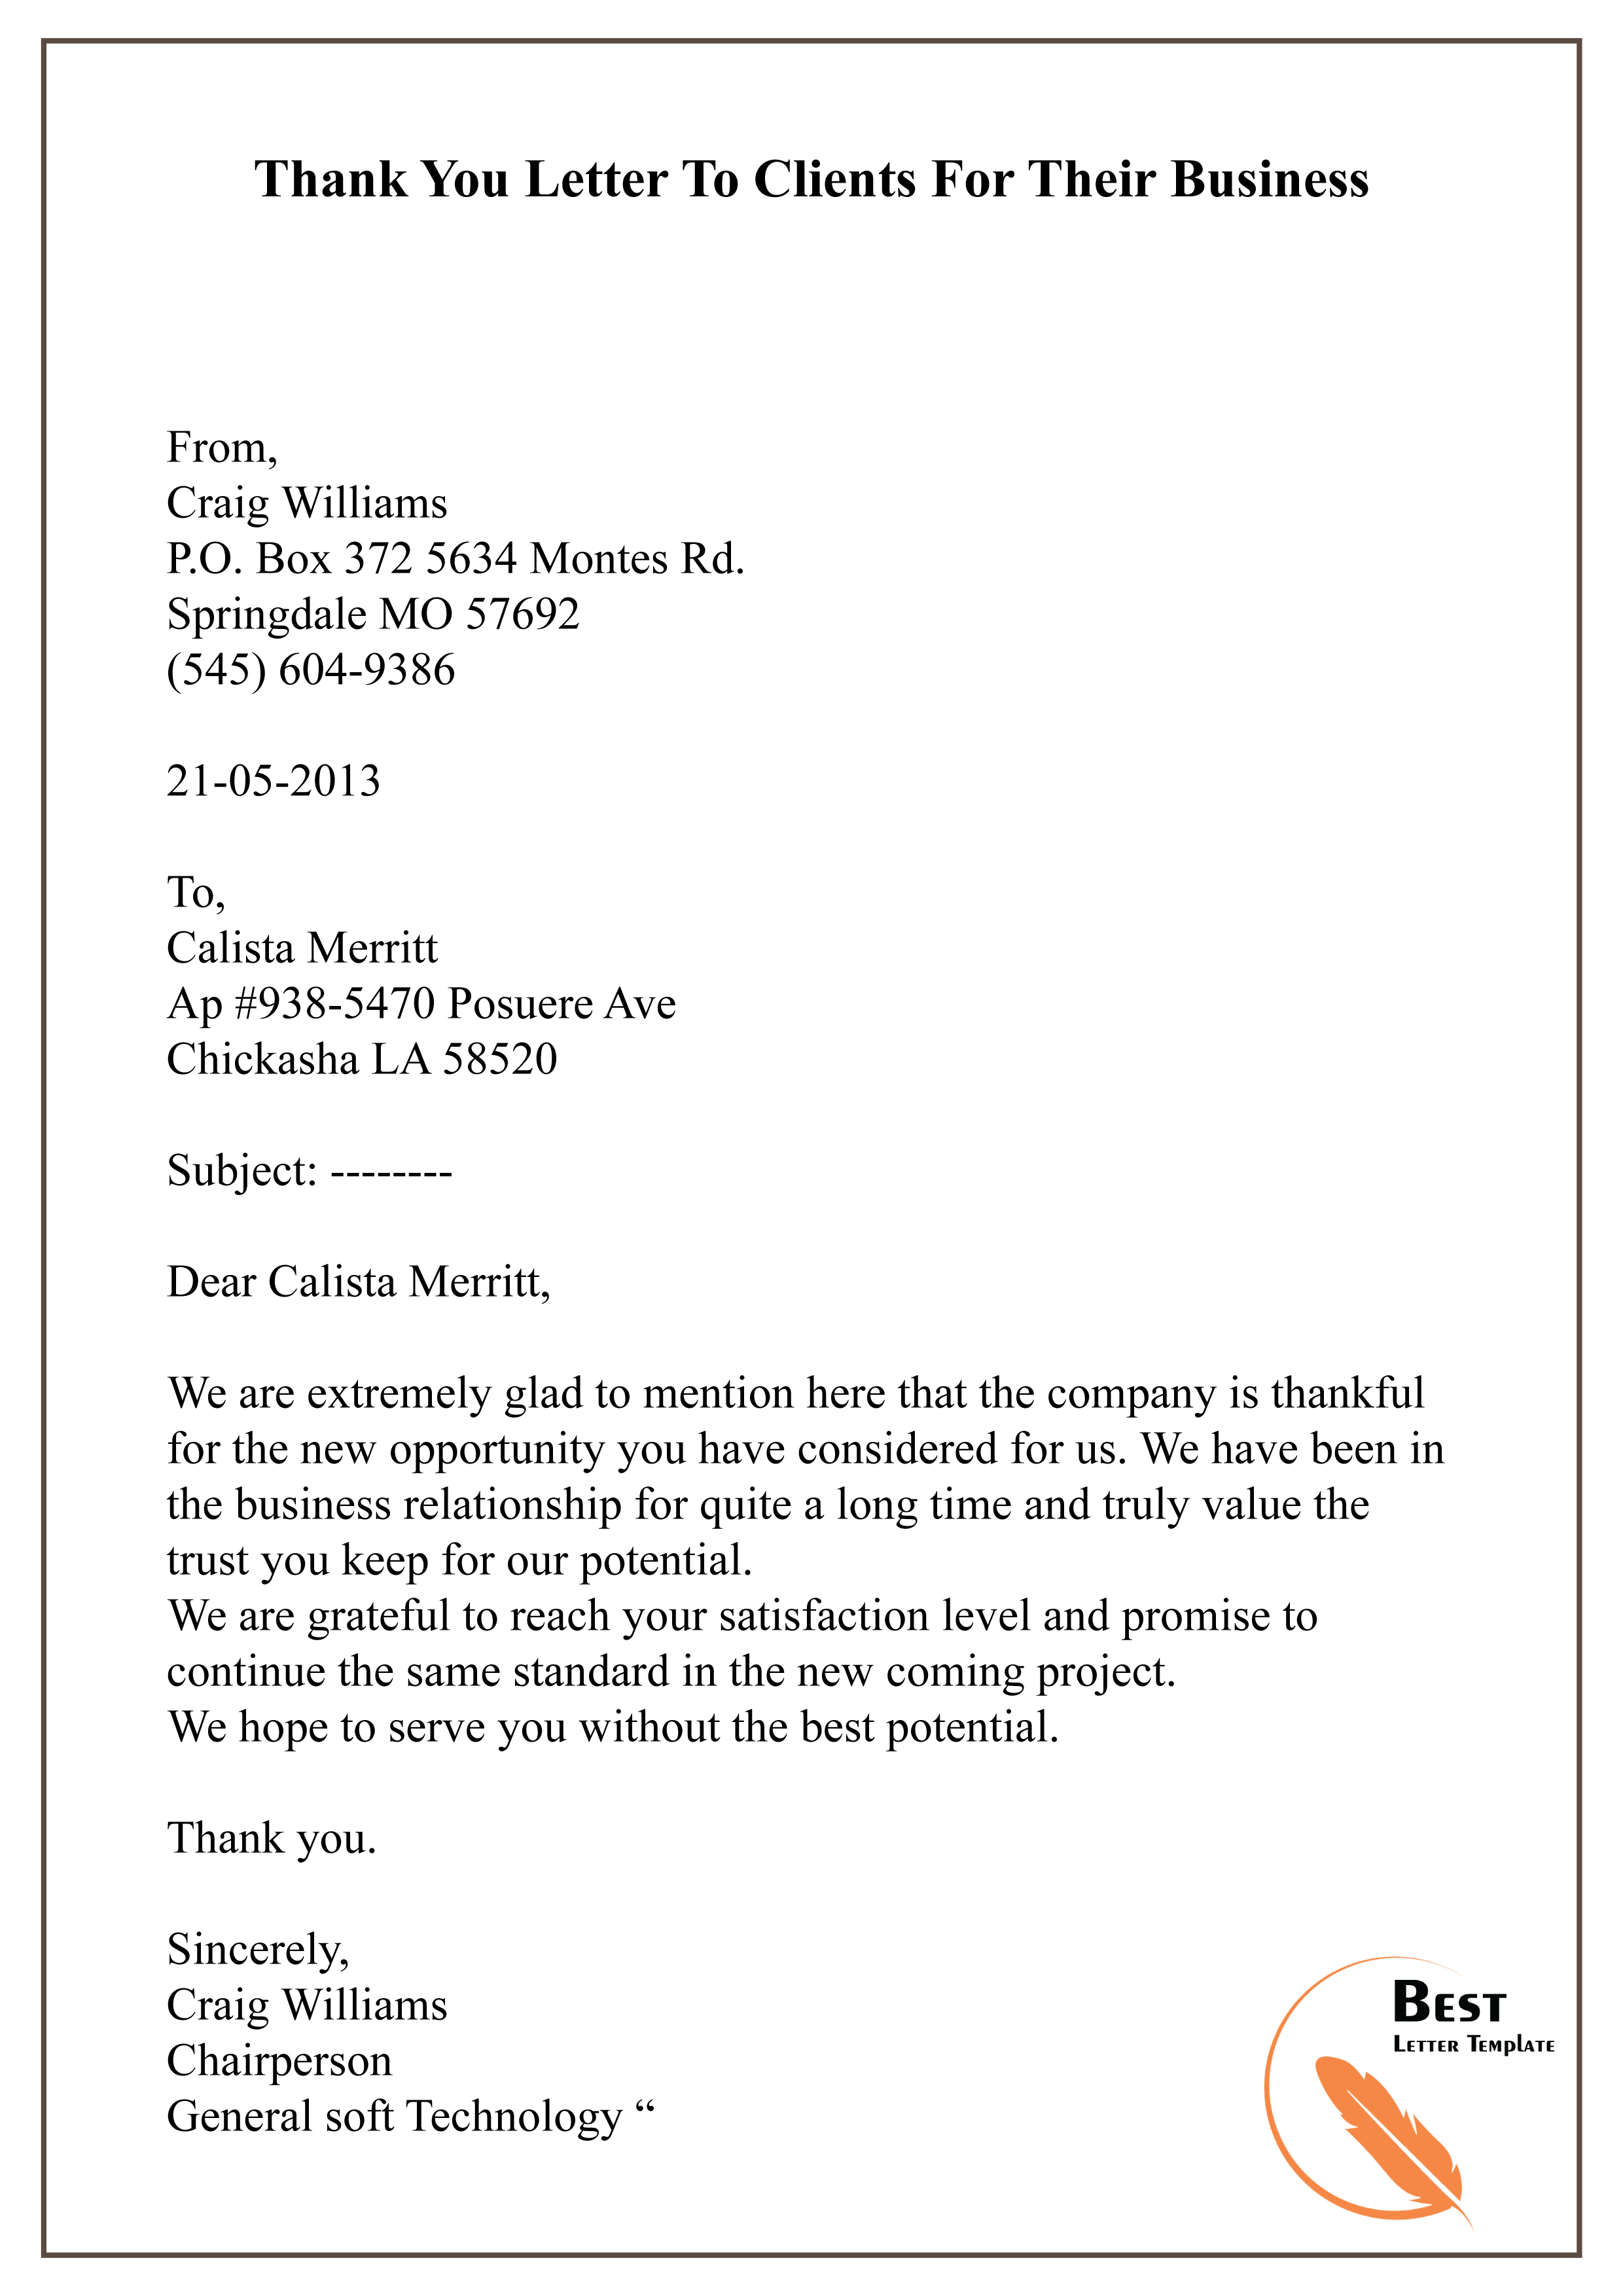 Customer Thank You Letter from bestlettertemplate.com